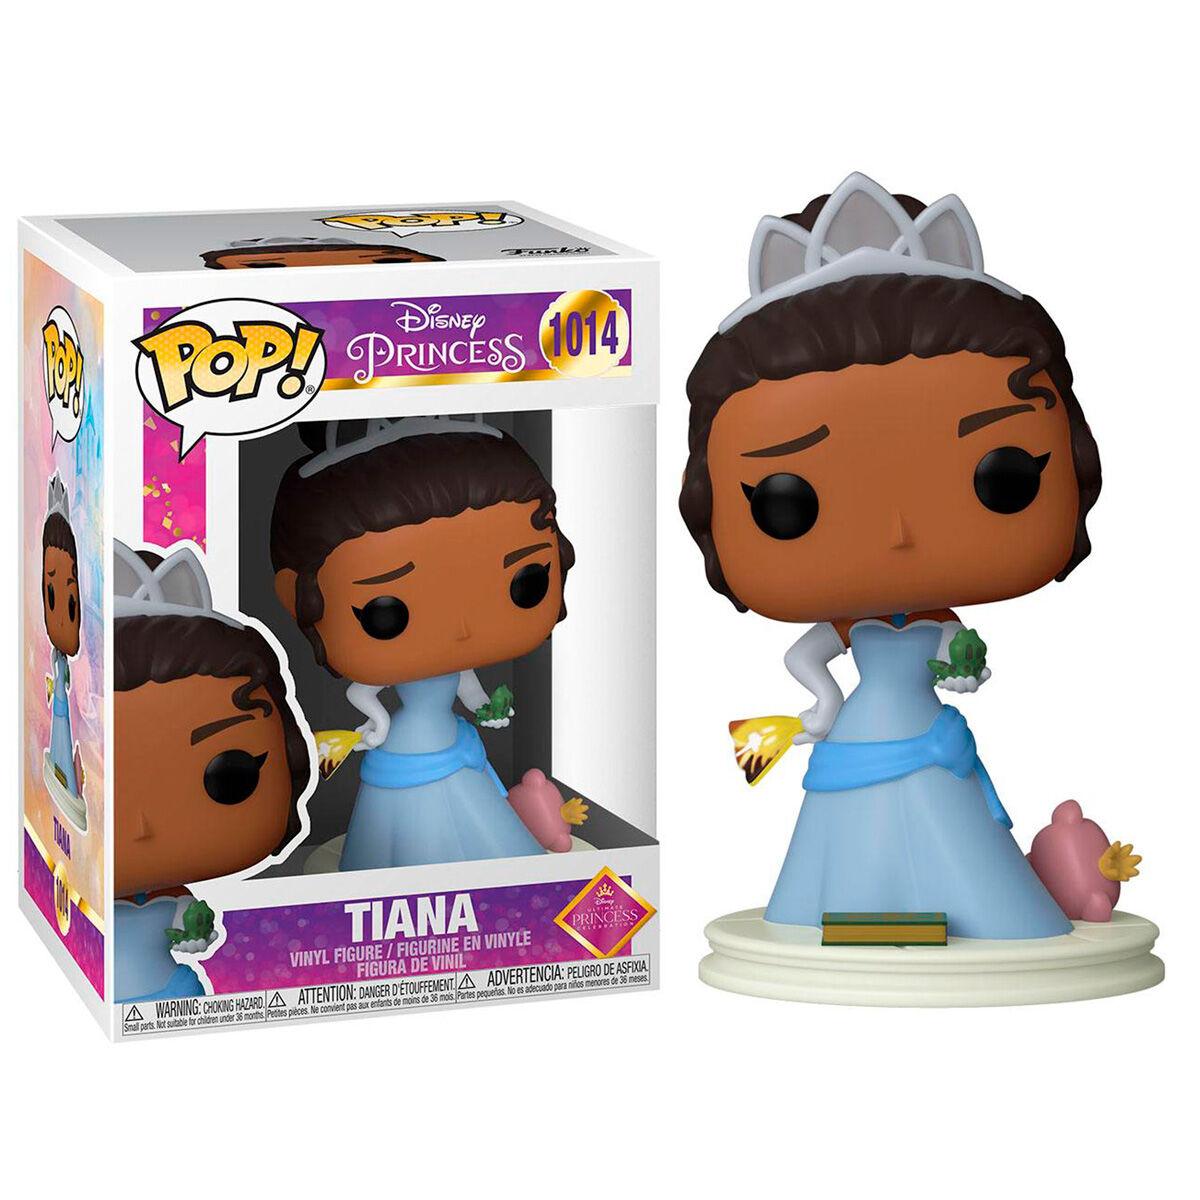 Disney Princess - Bobble Head Funko Pop N°1014 : Ultimate Princess Tiana